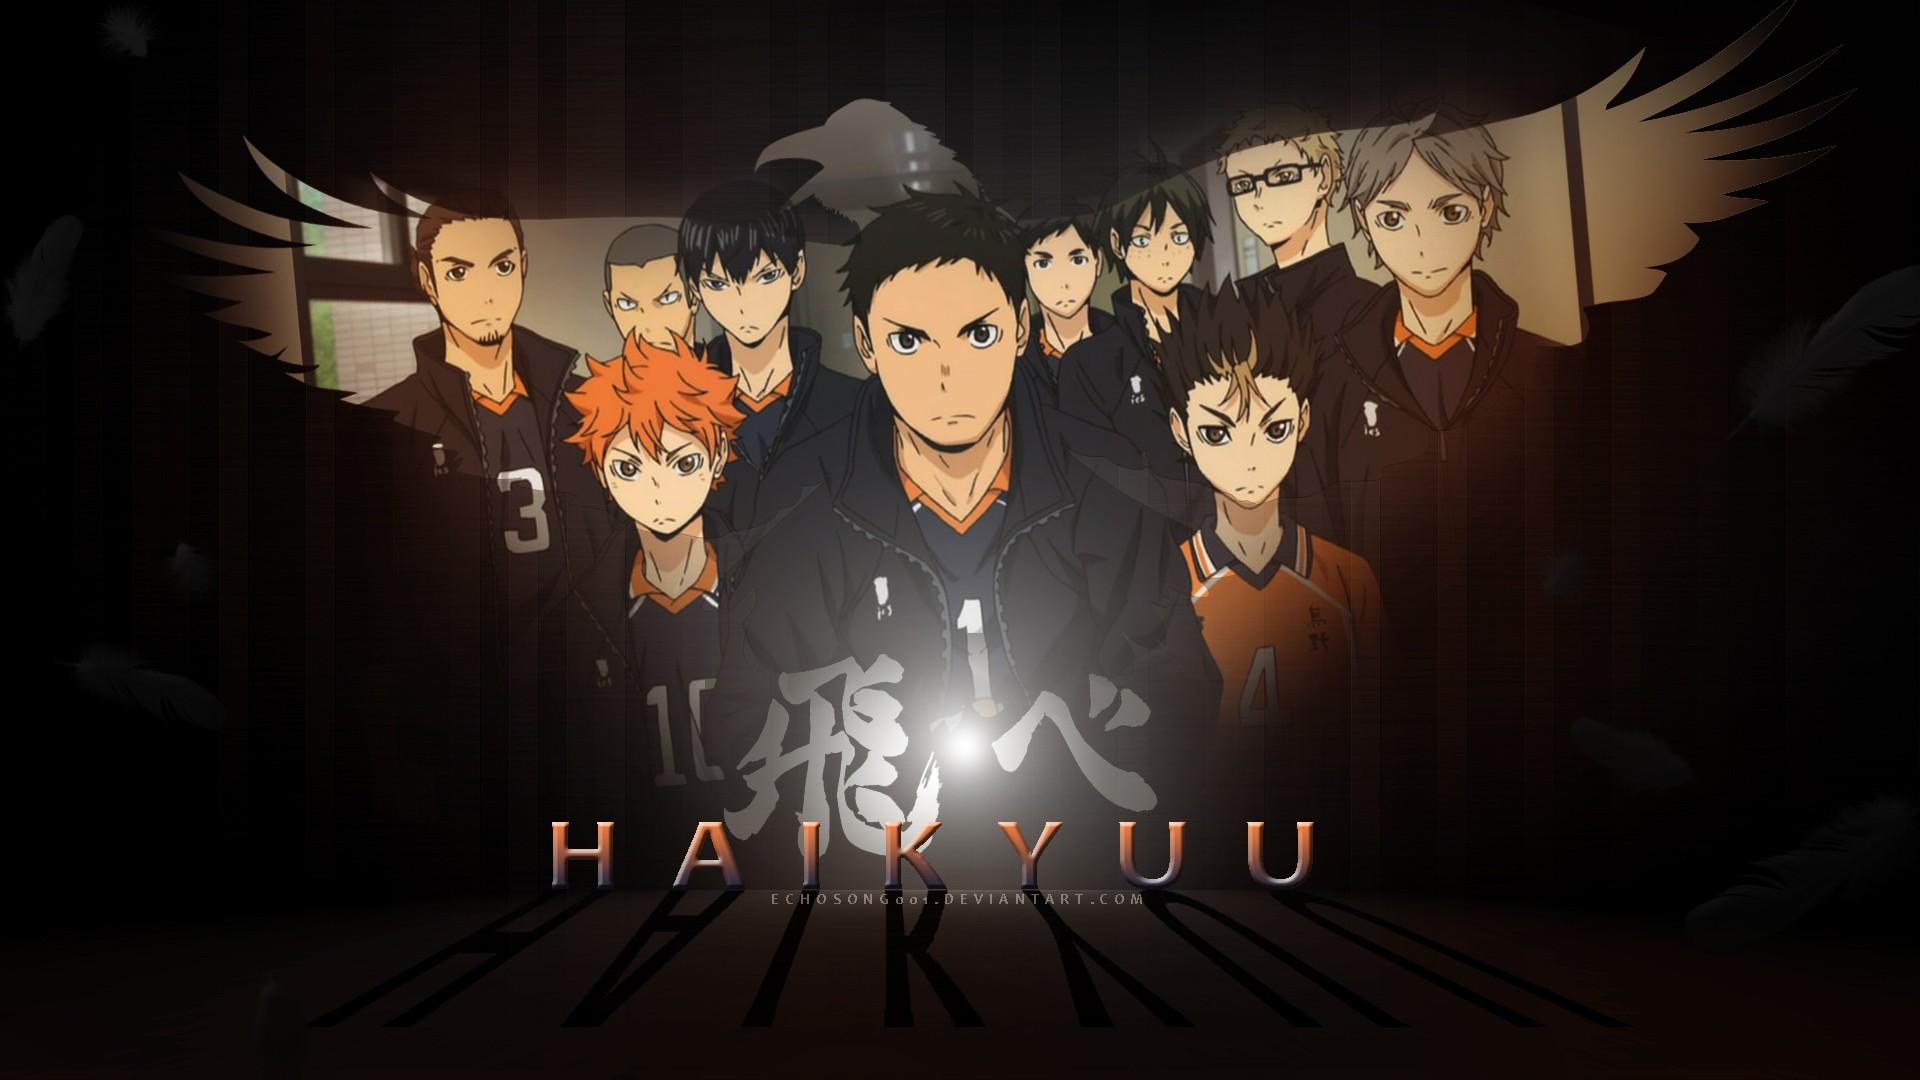 Haikyuu wallpaper ·① Download free cool High Resolution ...